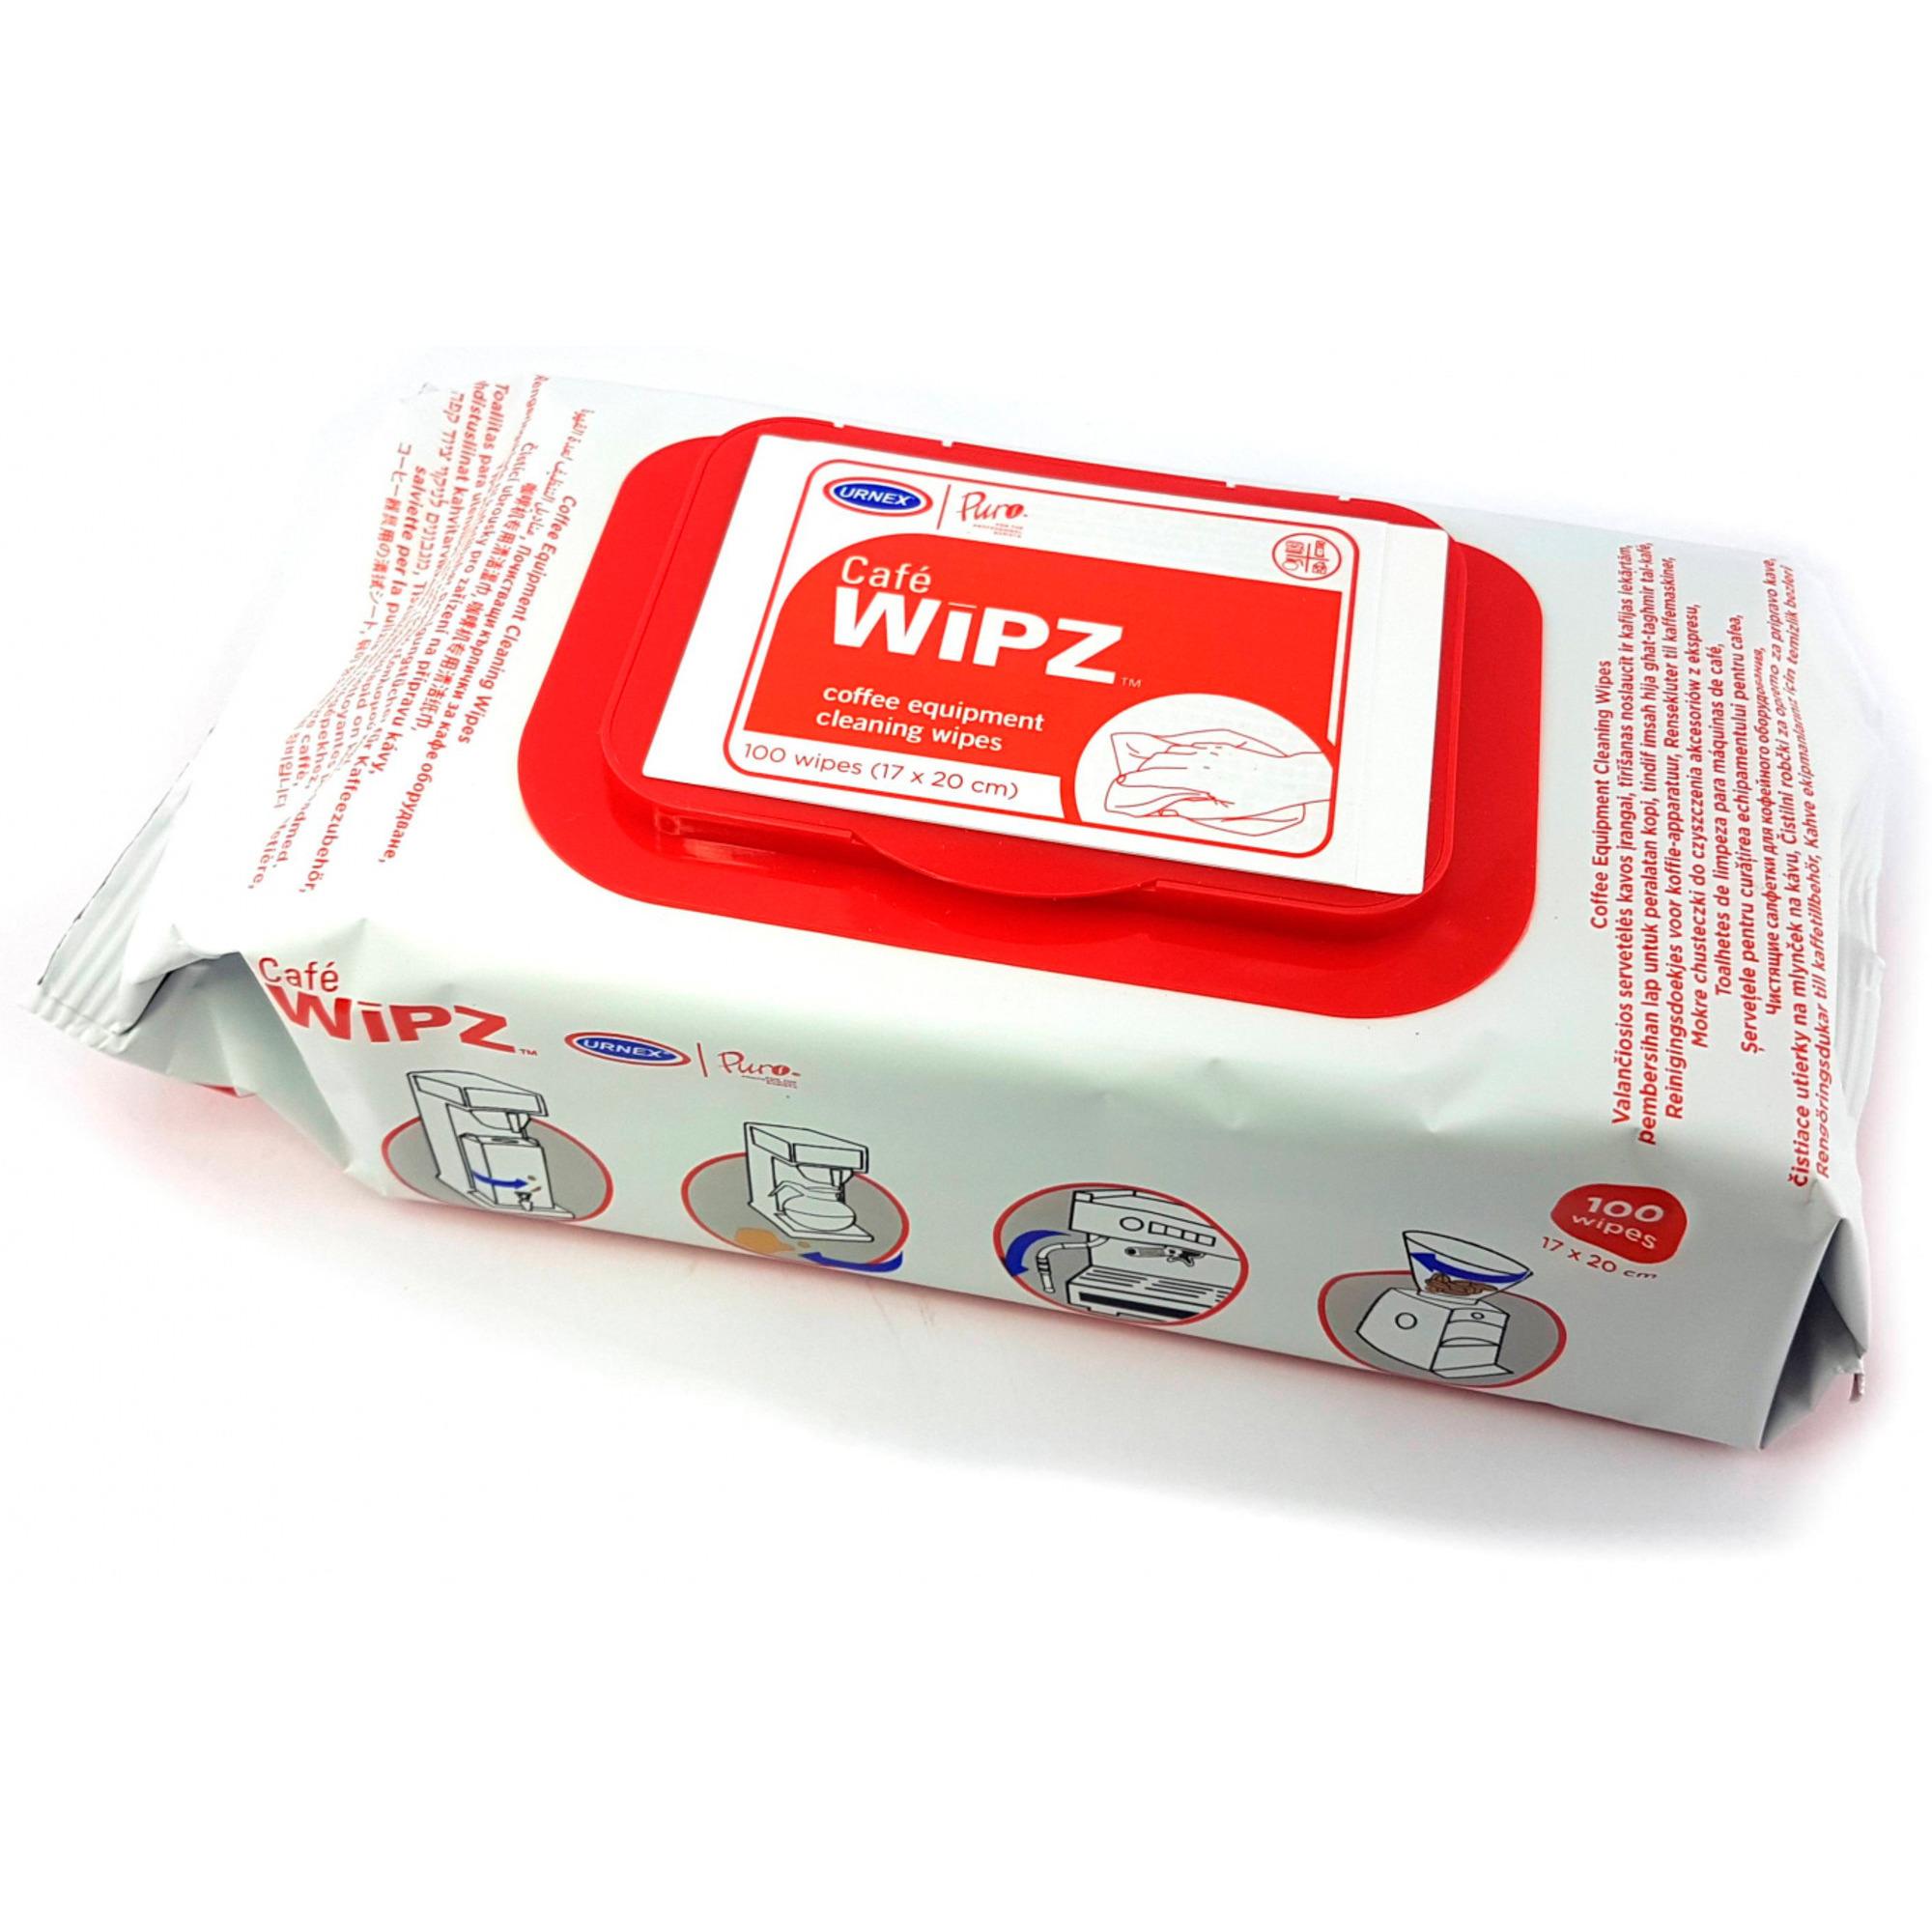 Urnex Café WIPZ Rengöringsservetter 100 st